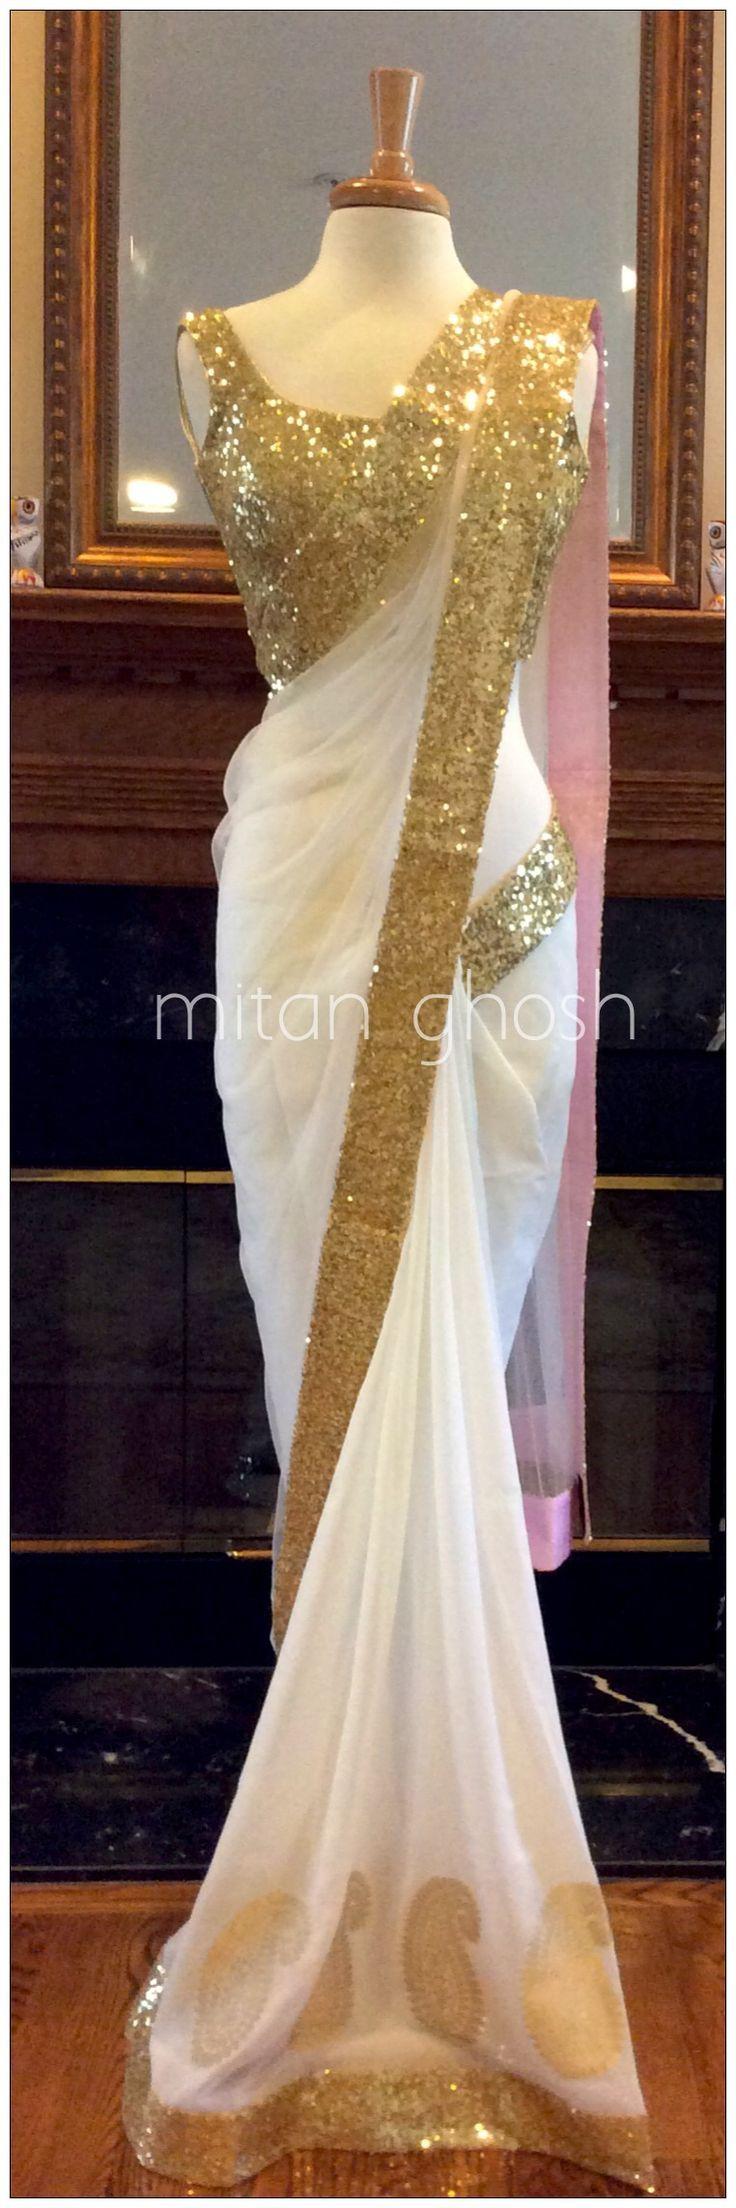 Bridesmaid saree- stunning i think more of a wedding saree!!